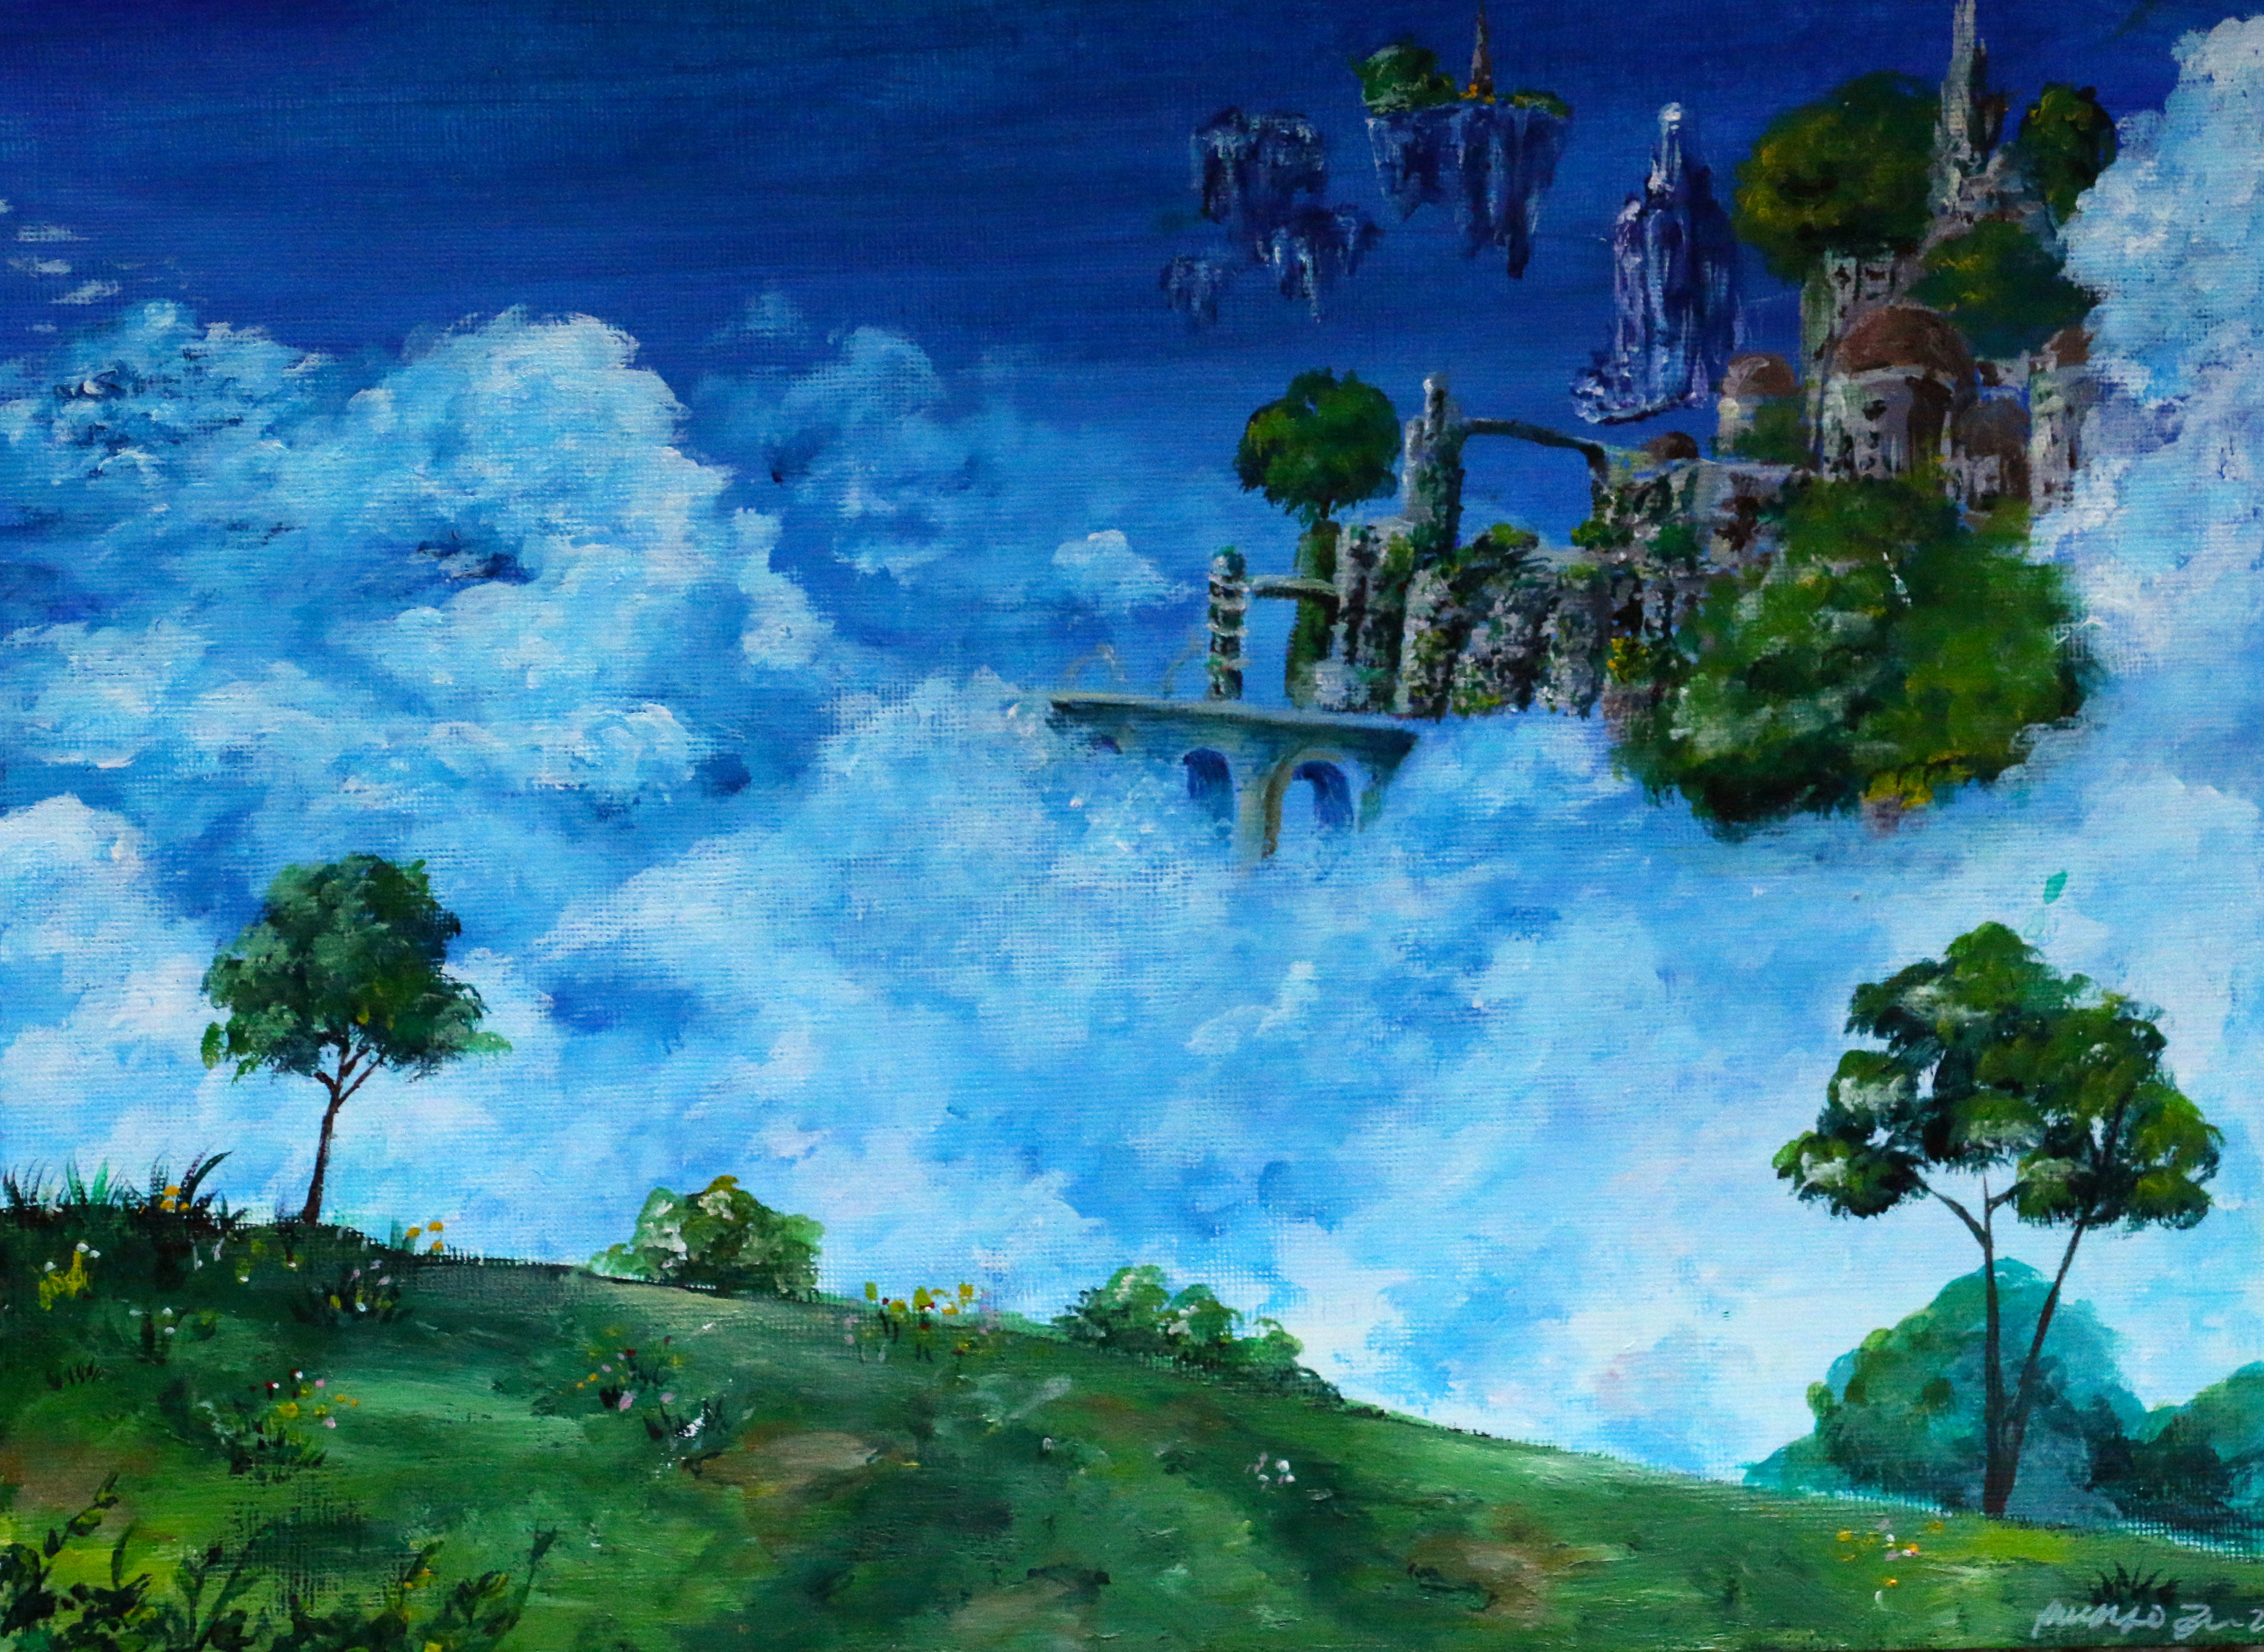 [Sub/Kara] Laputa - Castle In The Sky Theme Song ... - YouTube